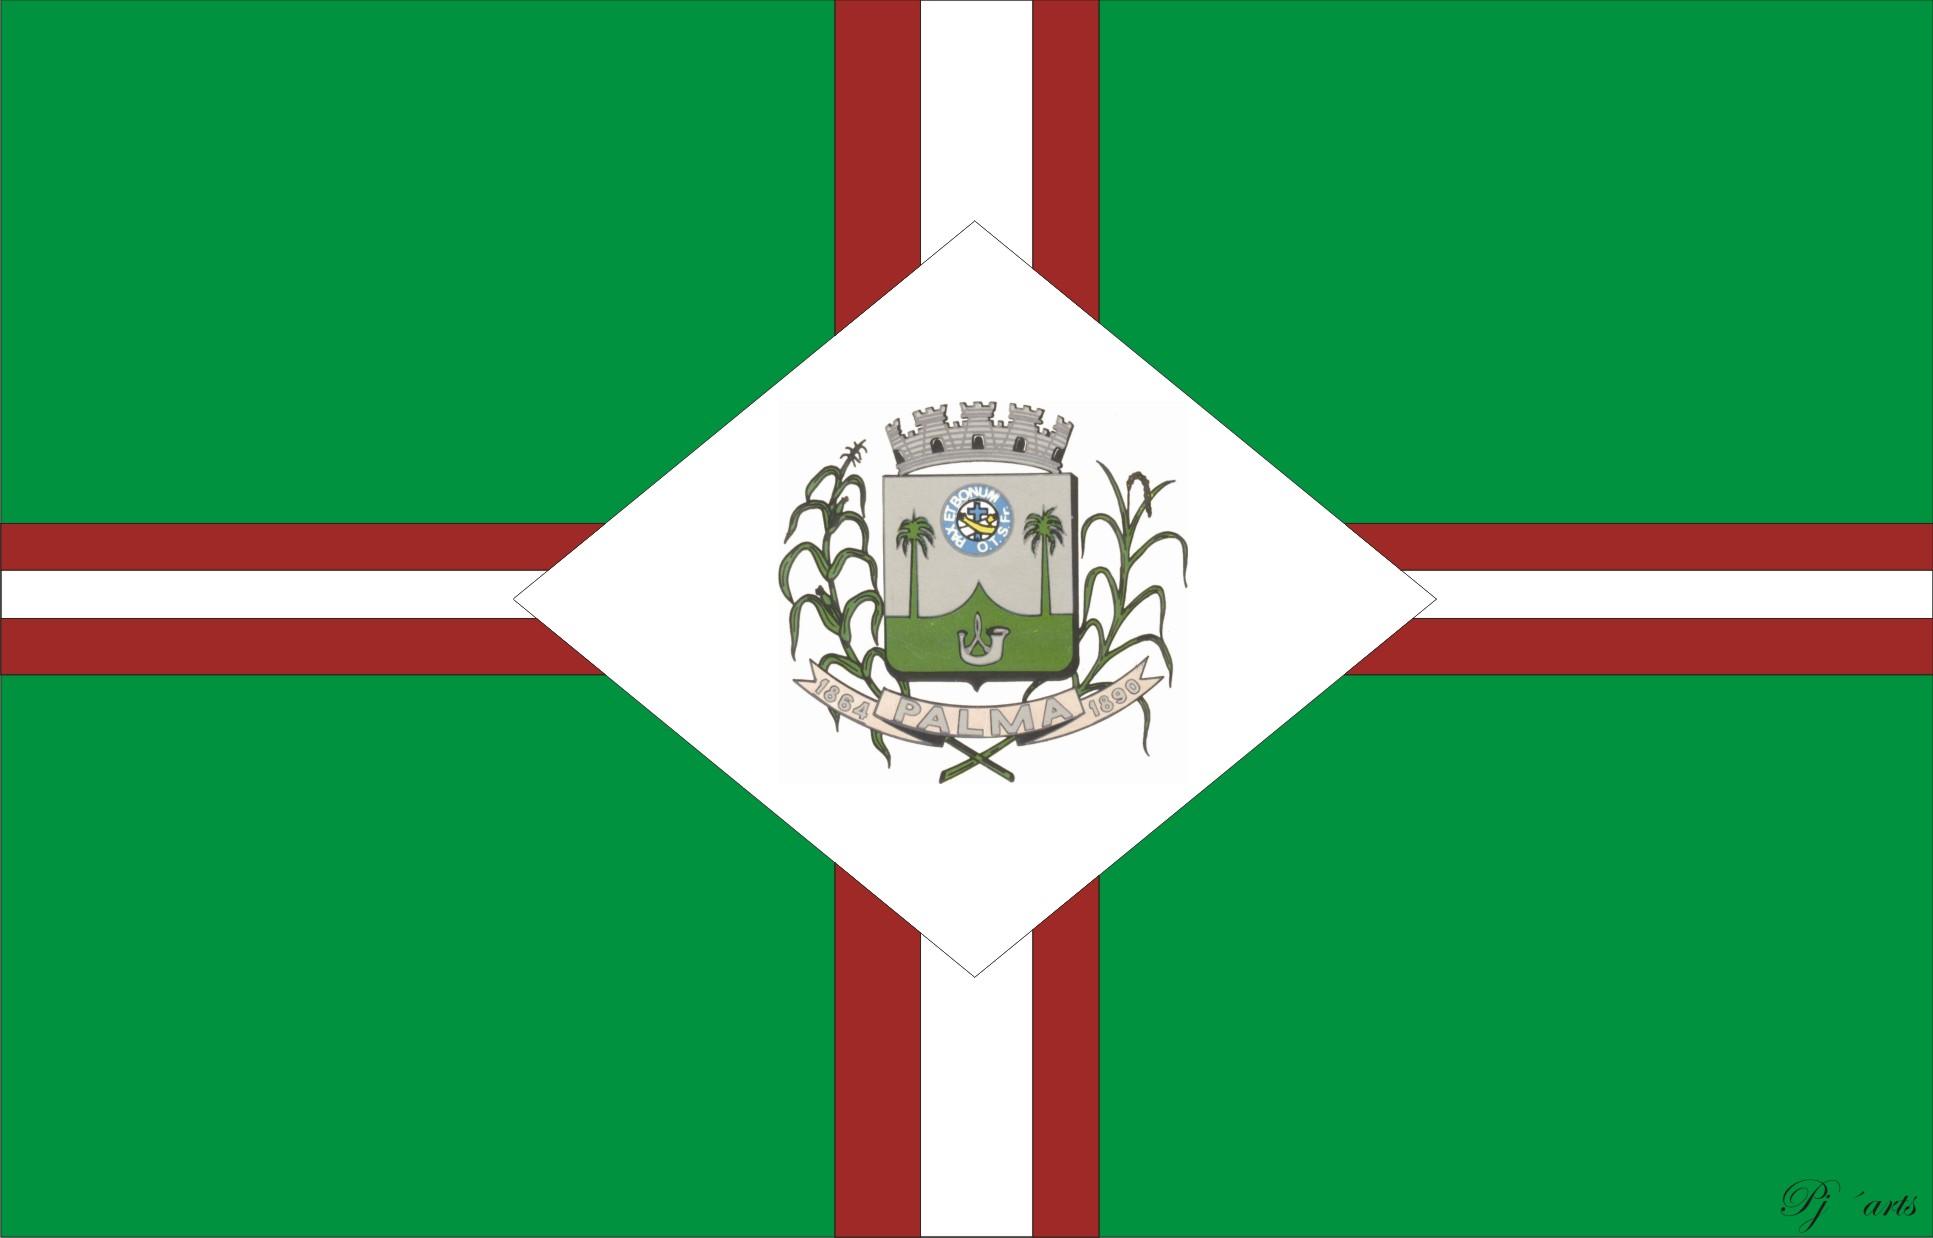 Bandera de Palma, Minas Gerais